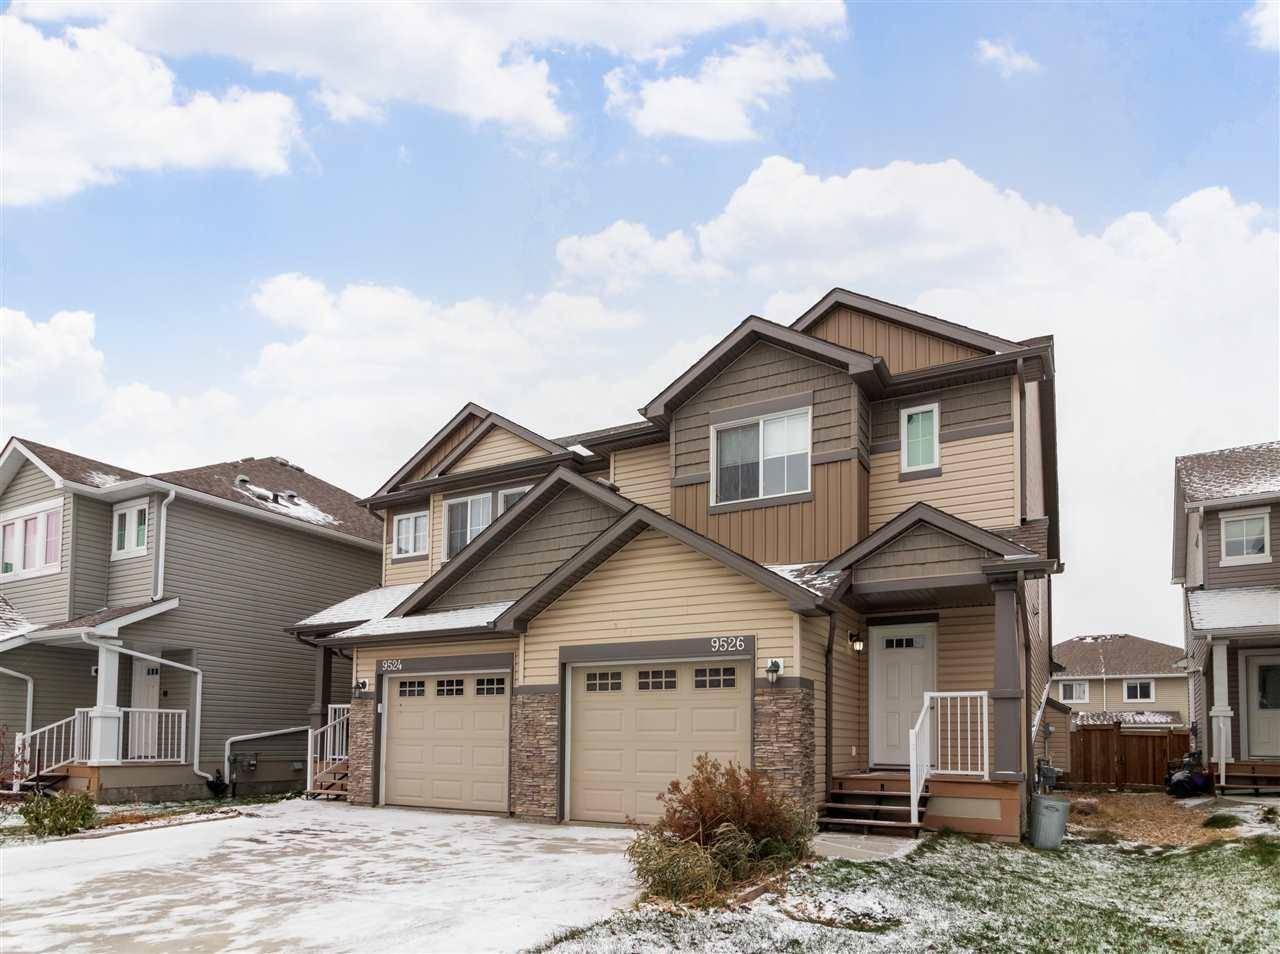 Townhouse for sale at 9526 Simpson Ct Nw Edmonton Alberta - MLS: E4177996